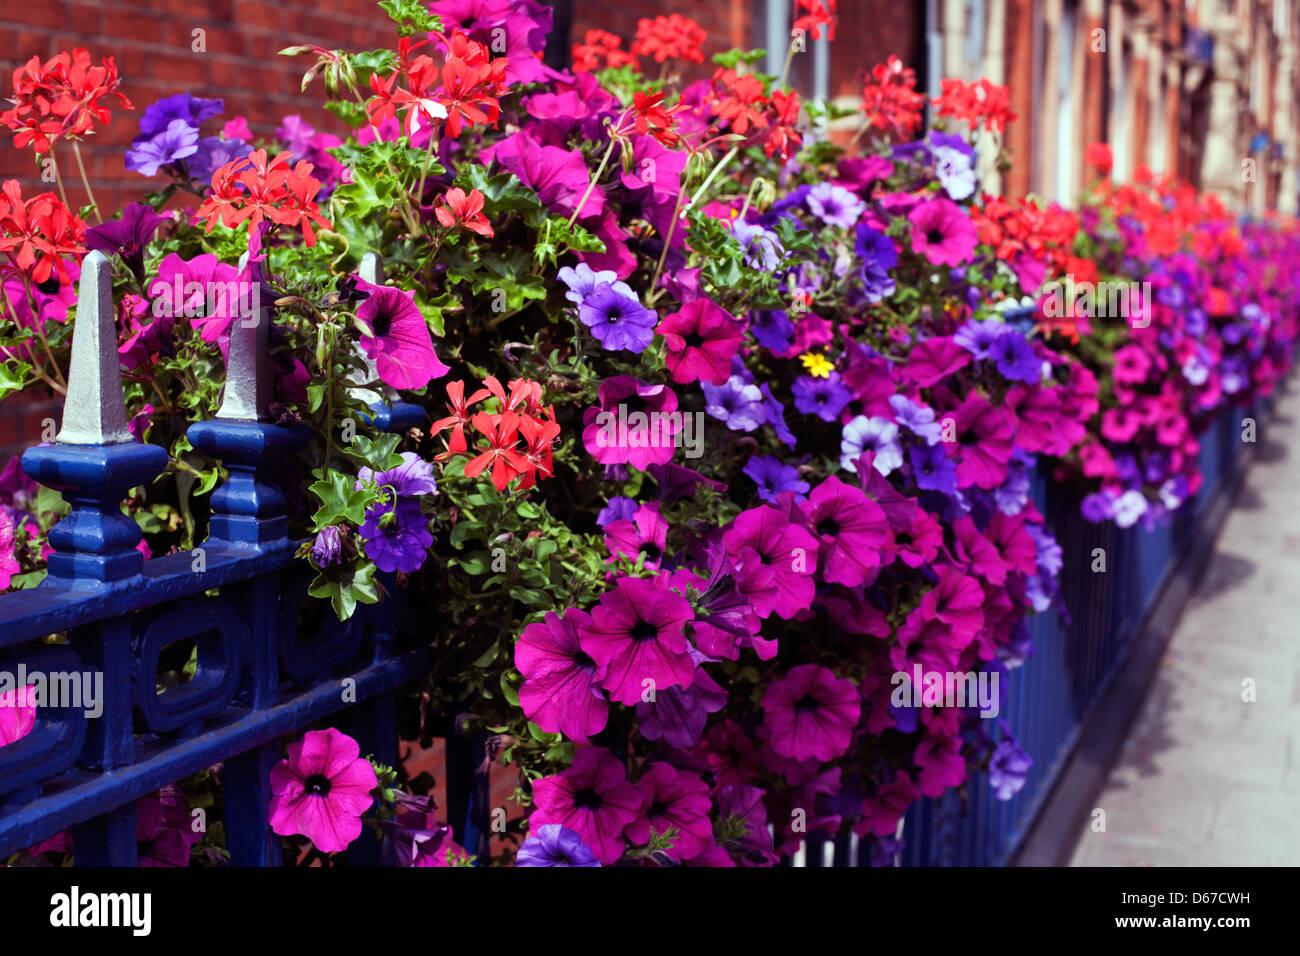 Petunia and geranium display, Bickenhall Mansions, Bickenhall Street, Marylebone, London, England, UK, Europe - Stock Image